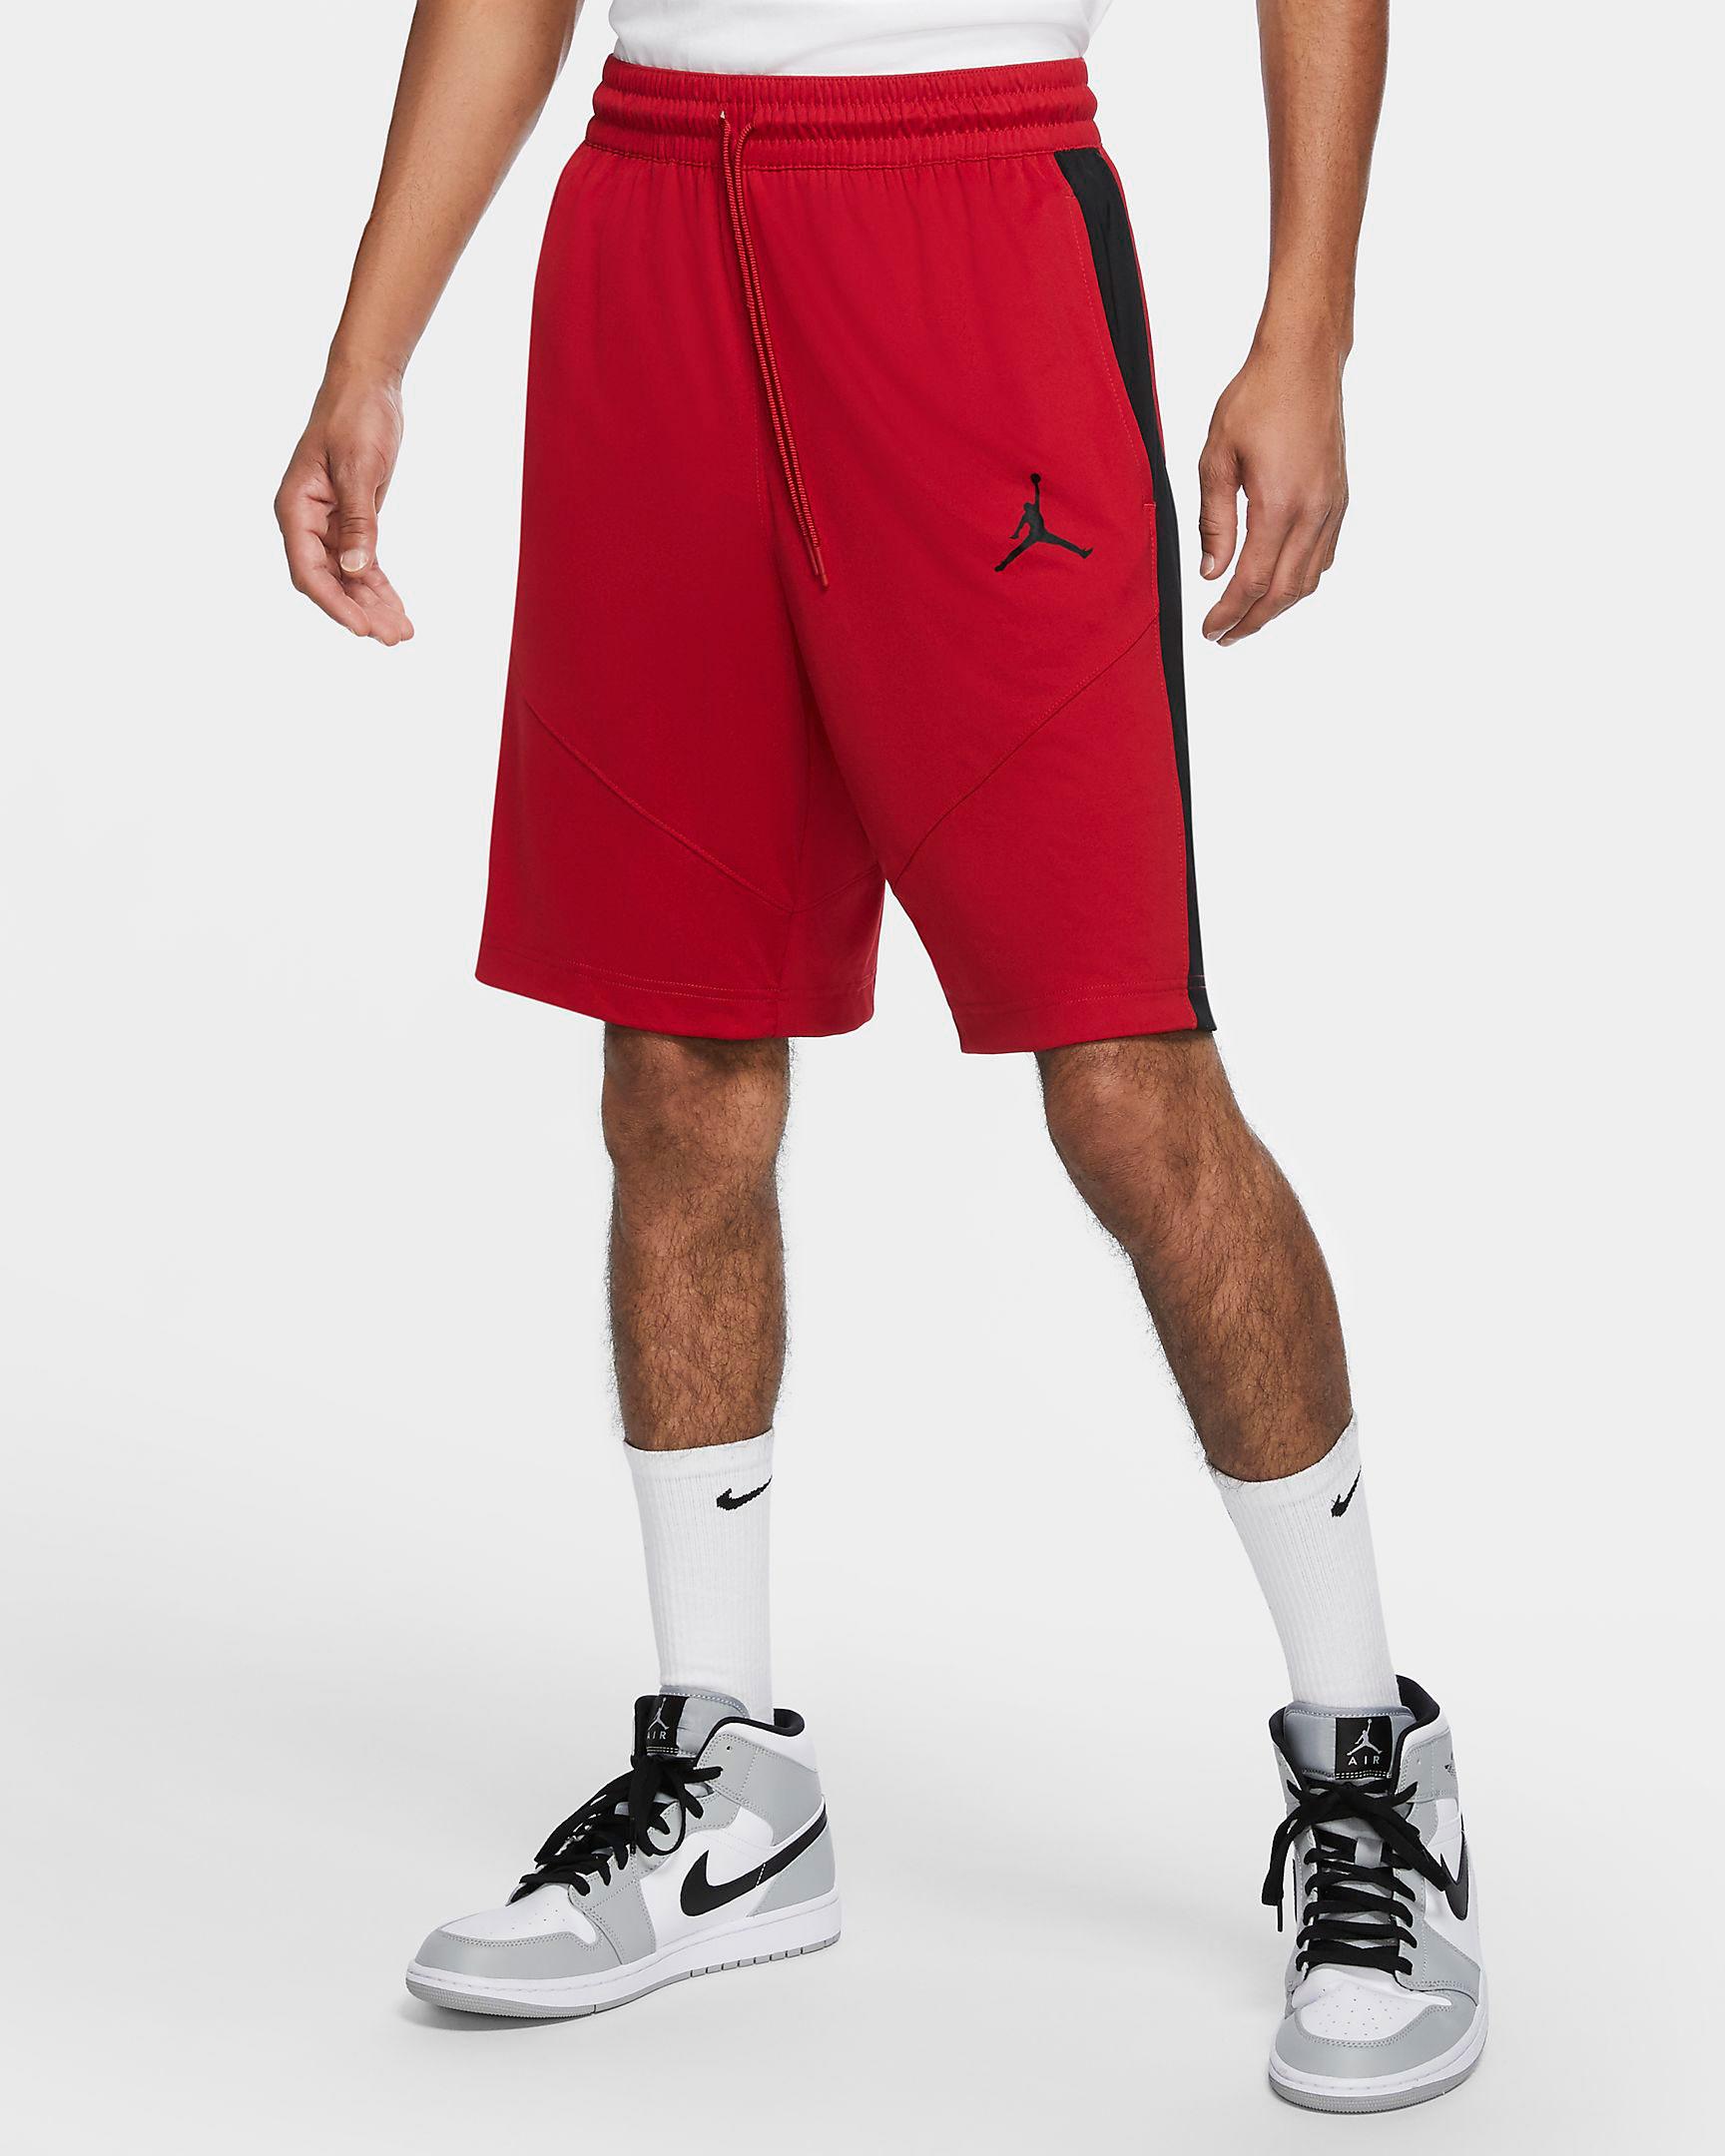 jordan-gym-red-black-basketball-shorts-1